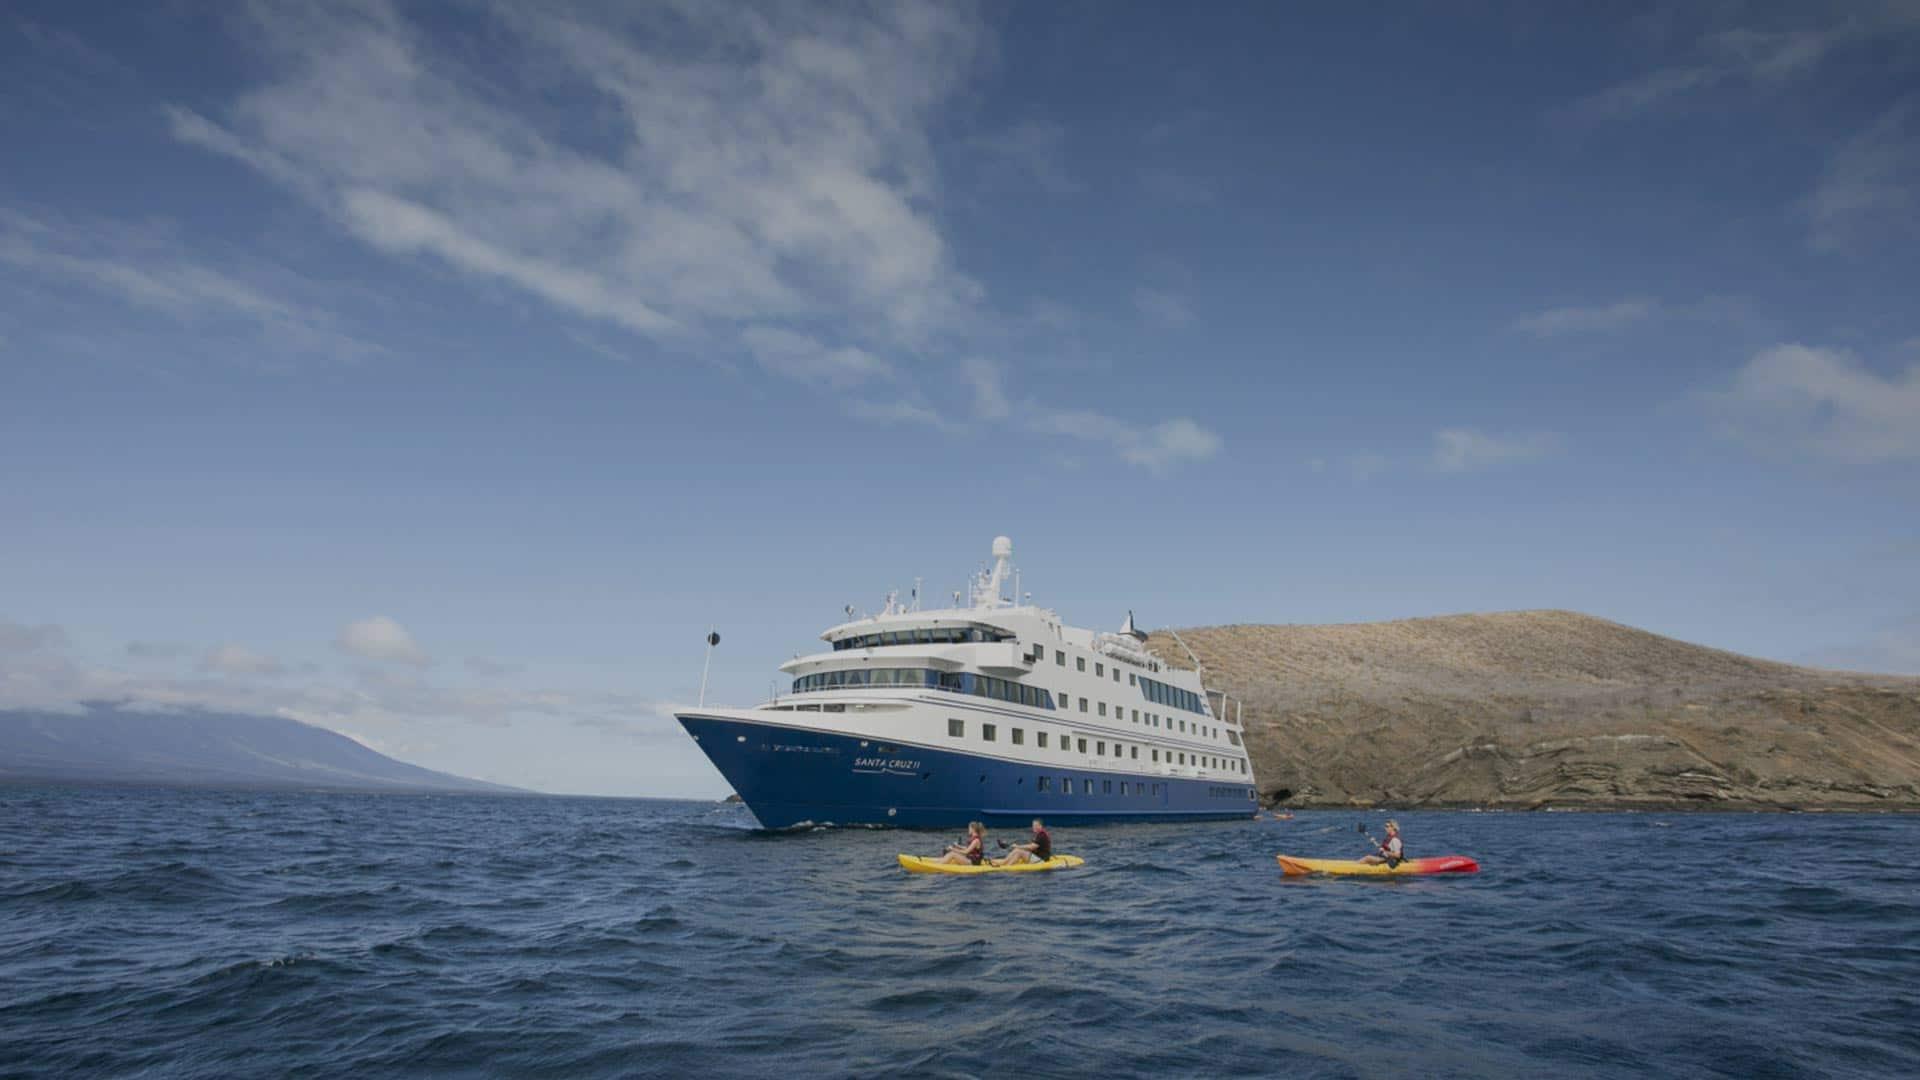 Santa Cruz II Cruise Ship